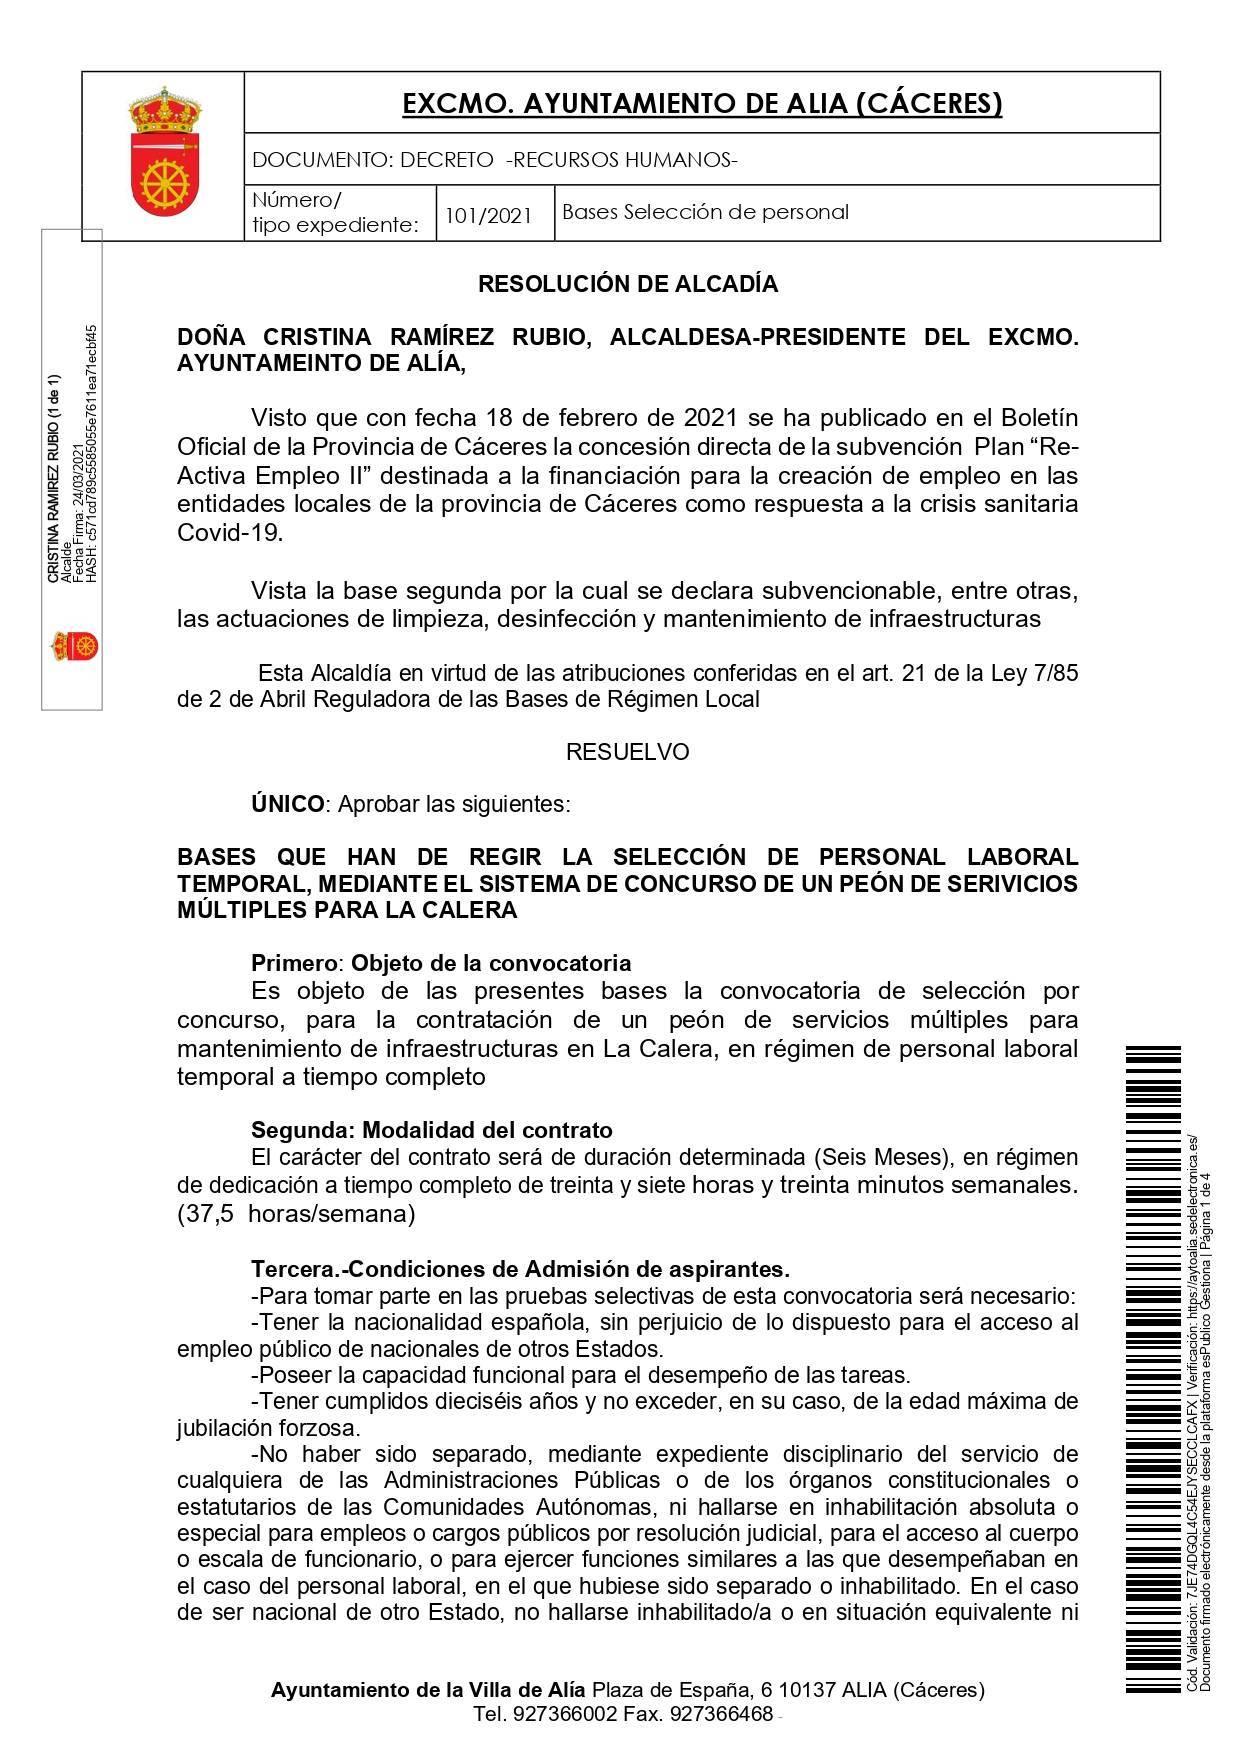 Peón de servicios múltiples (2021) - La Calera (Cáceres) 1